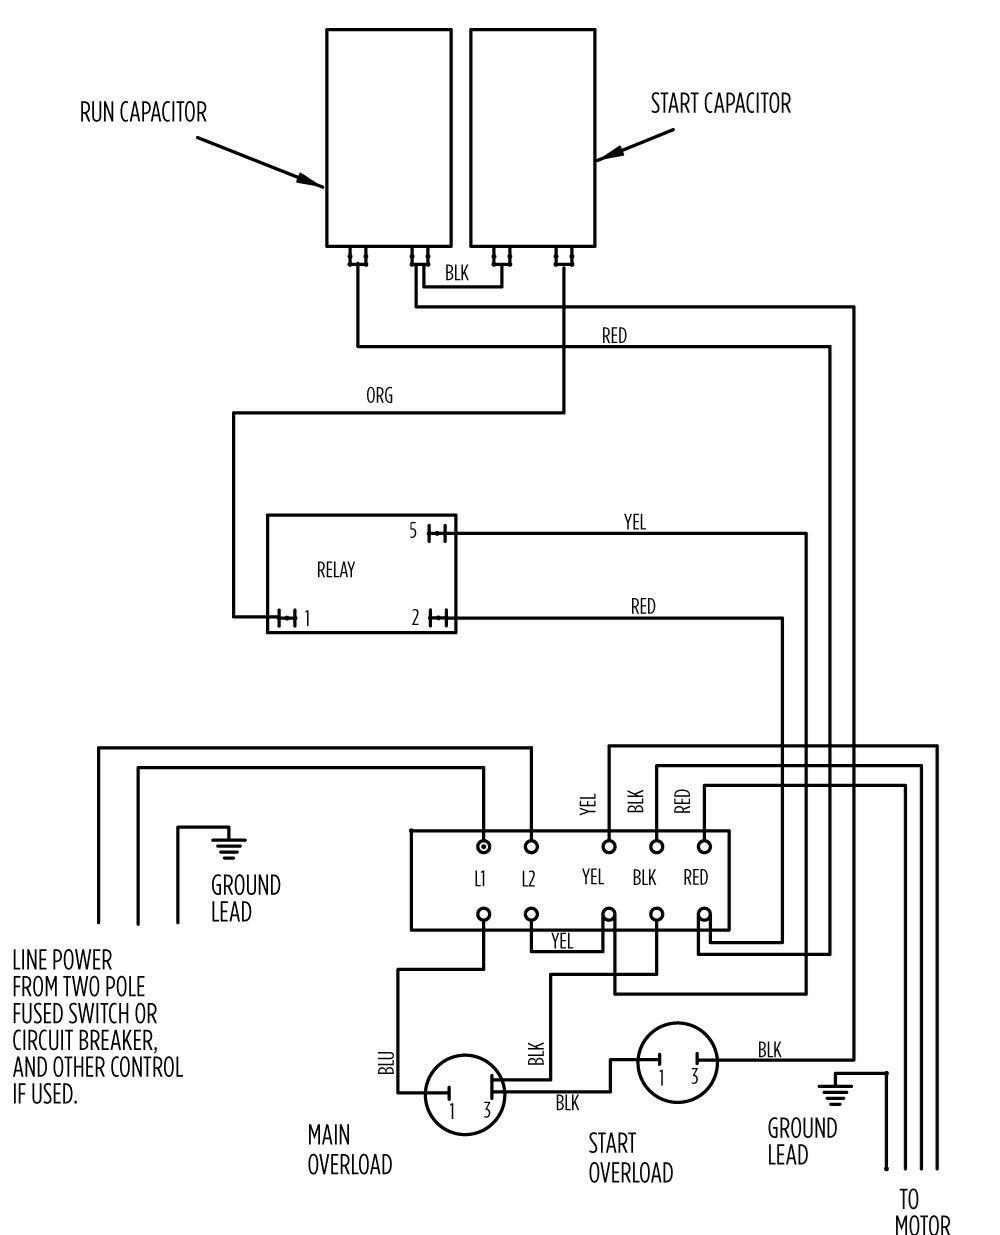 Excellent Aim Manual Page 55 Single Phase Motors And Controls Motor Wiring Cloud Ittabpendurdonanfuldomelitekicepsianuembamohammedshrineorg